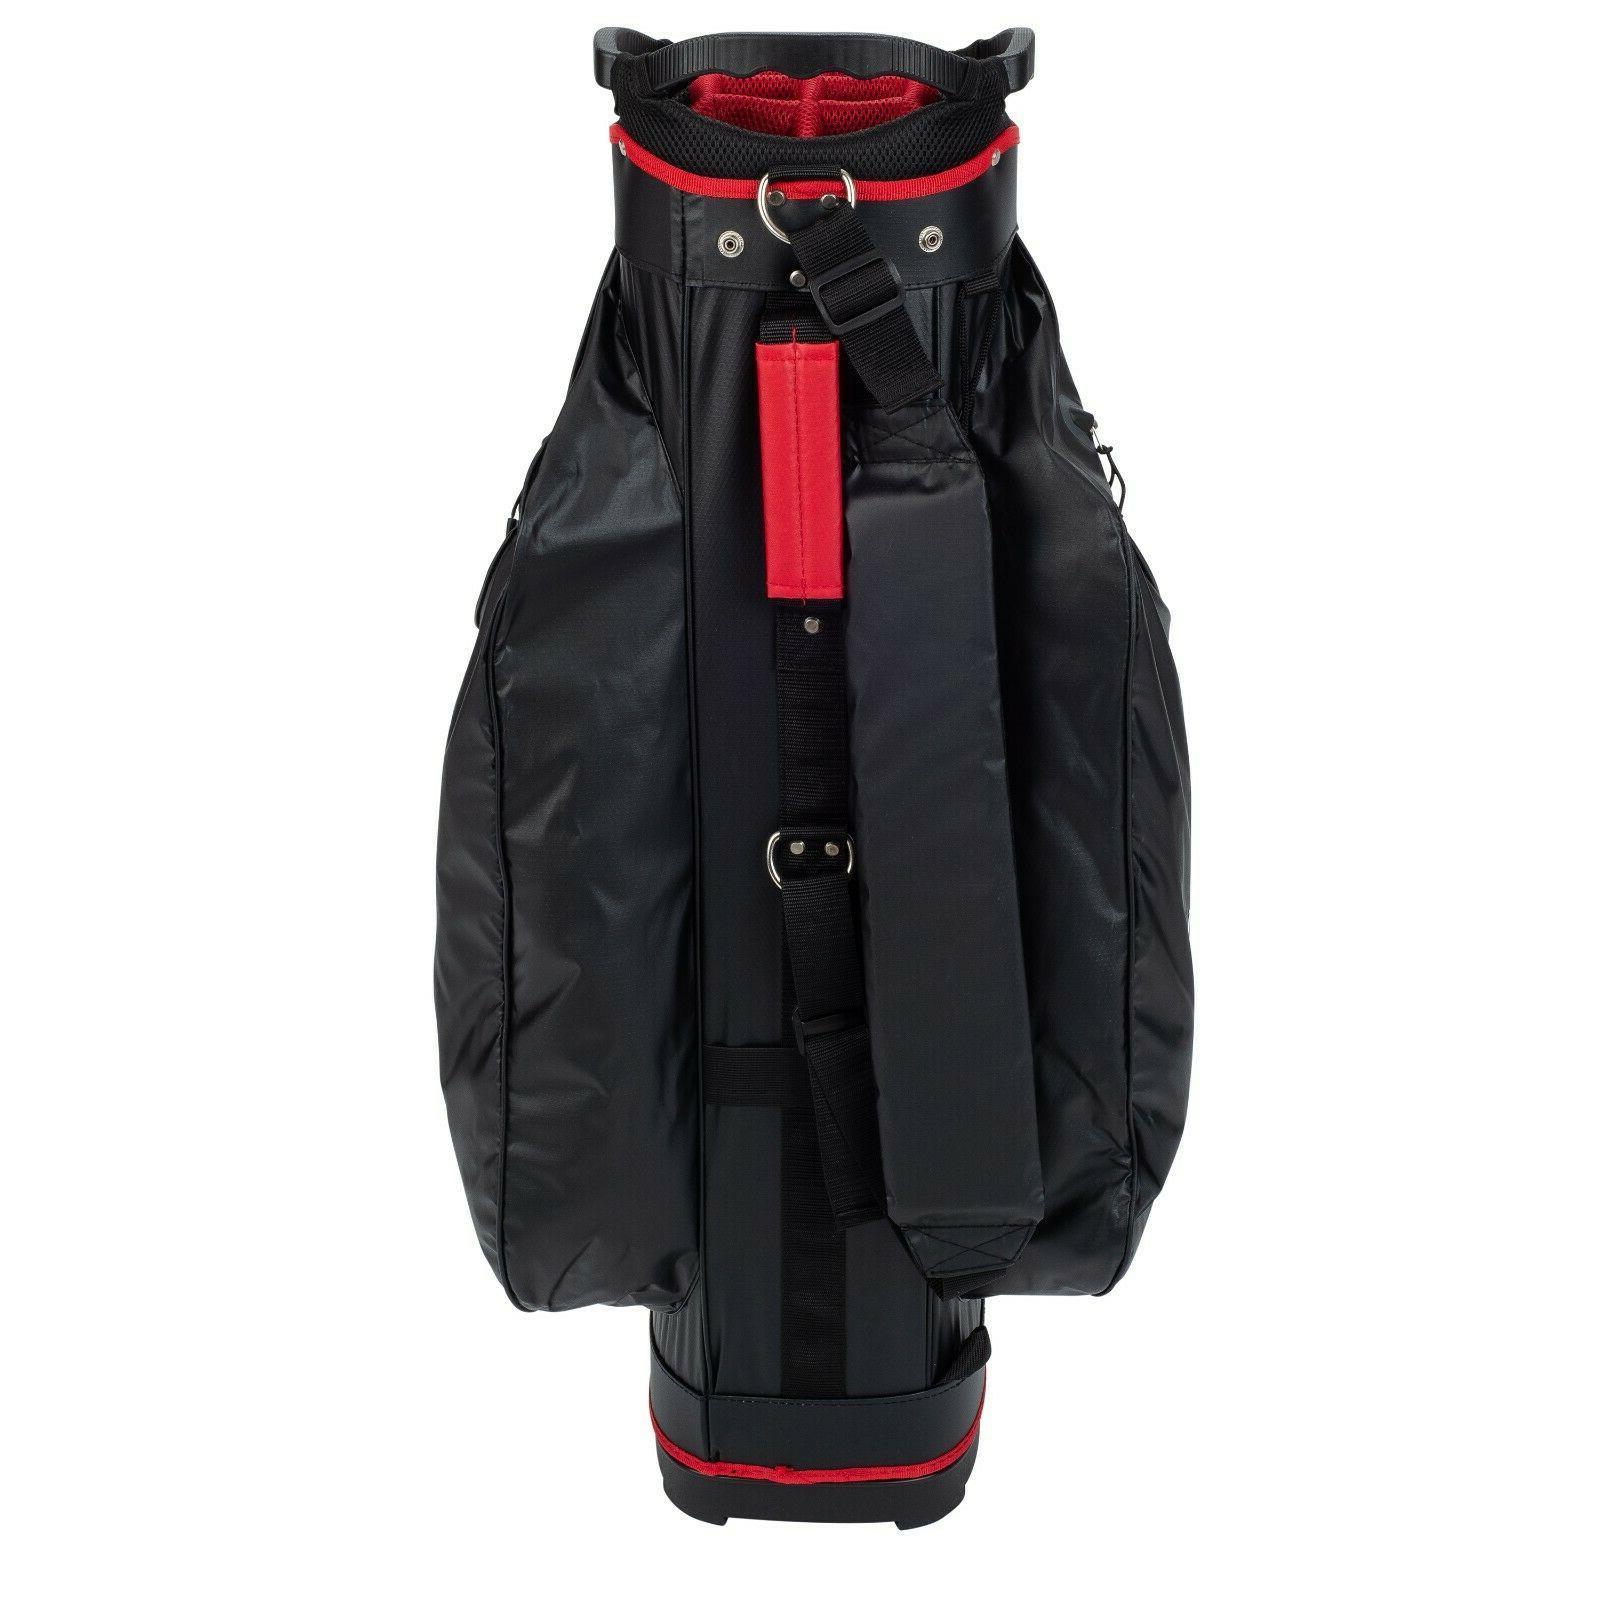 Founders Club Cart Bag Light Weight 14 Divider